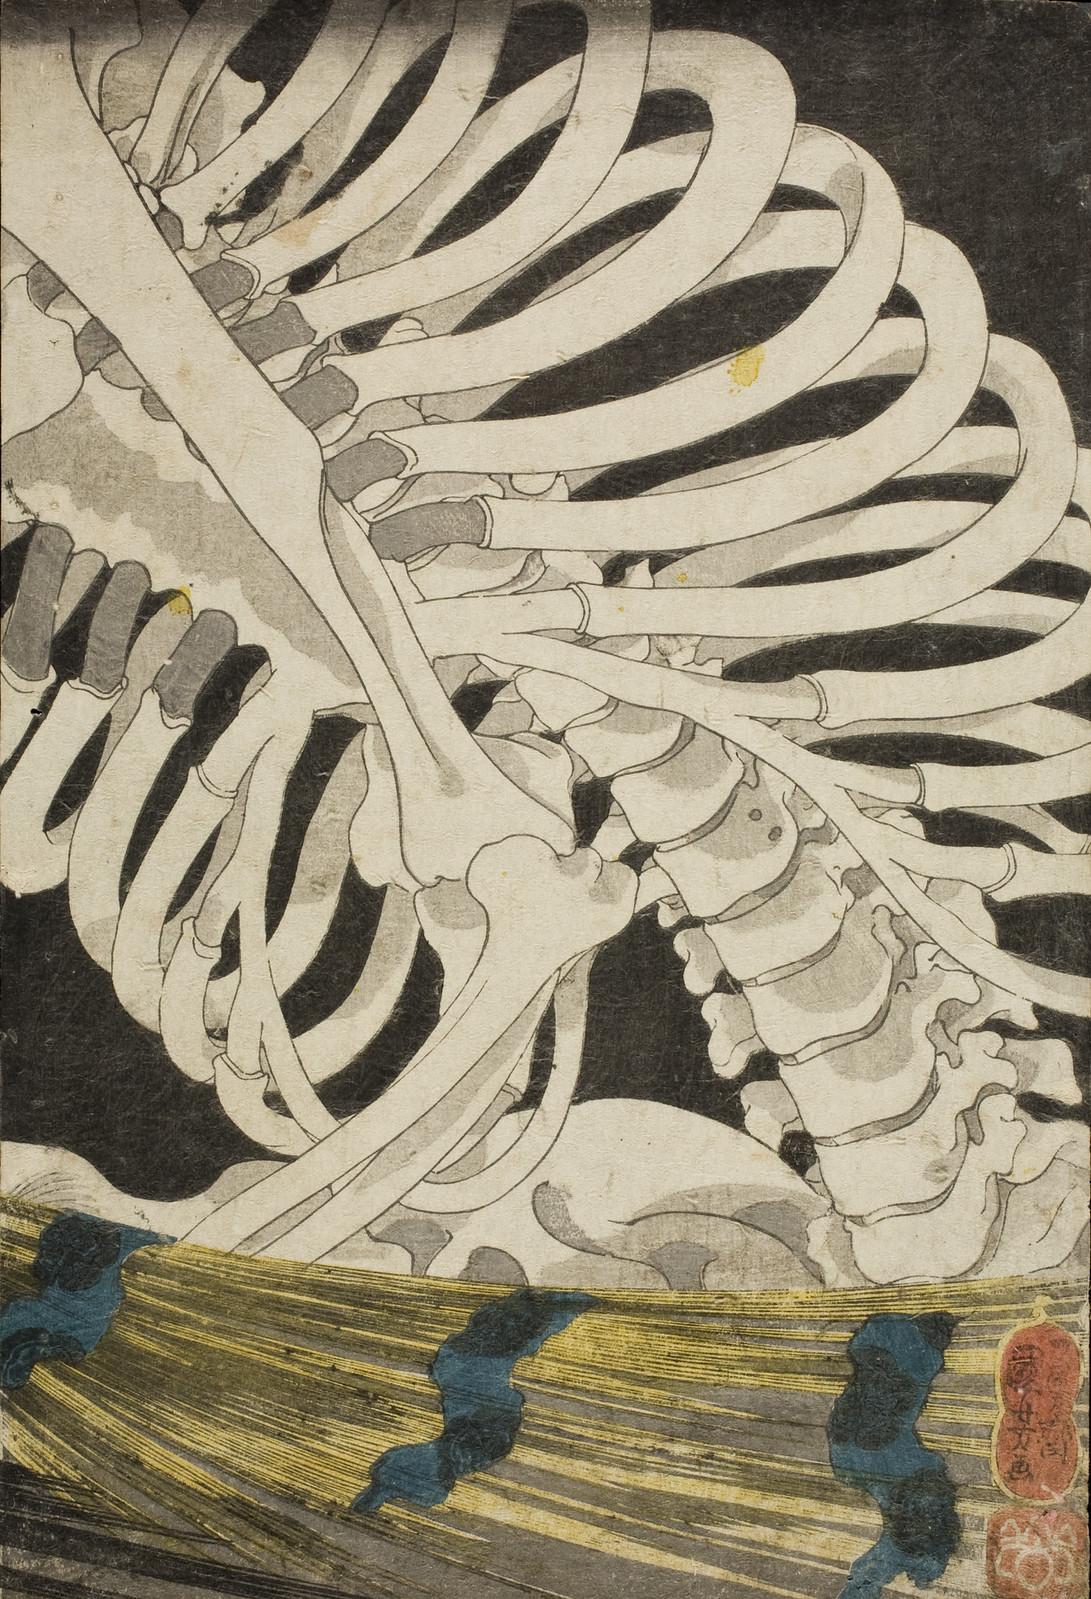 Utagawa Kuniyoshi - In the Ruined Palace at Sōma, Masakado's Daughter Takiyasha Uses Sorcery to Gather Allies 1844 (right panel)